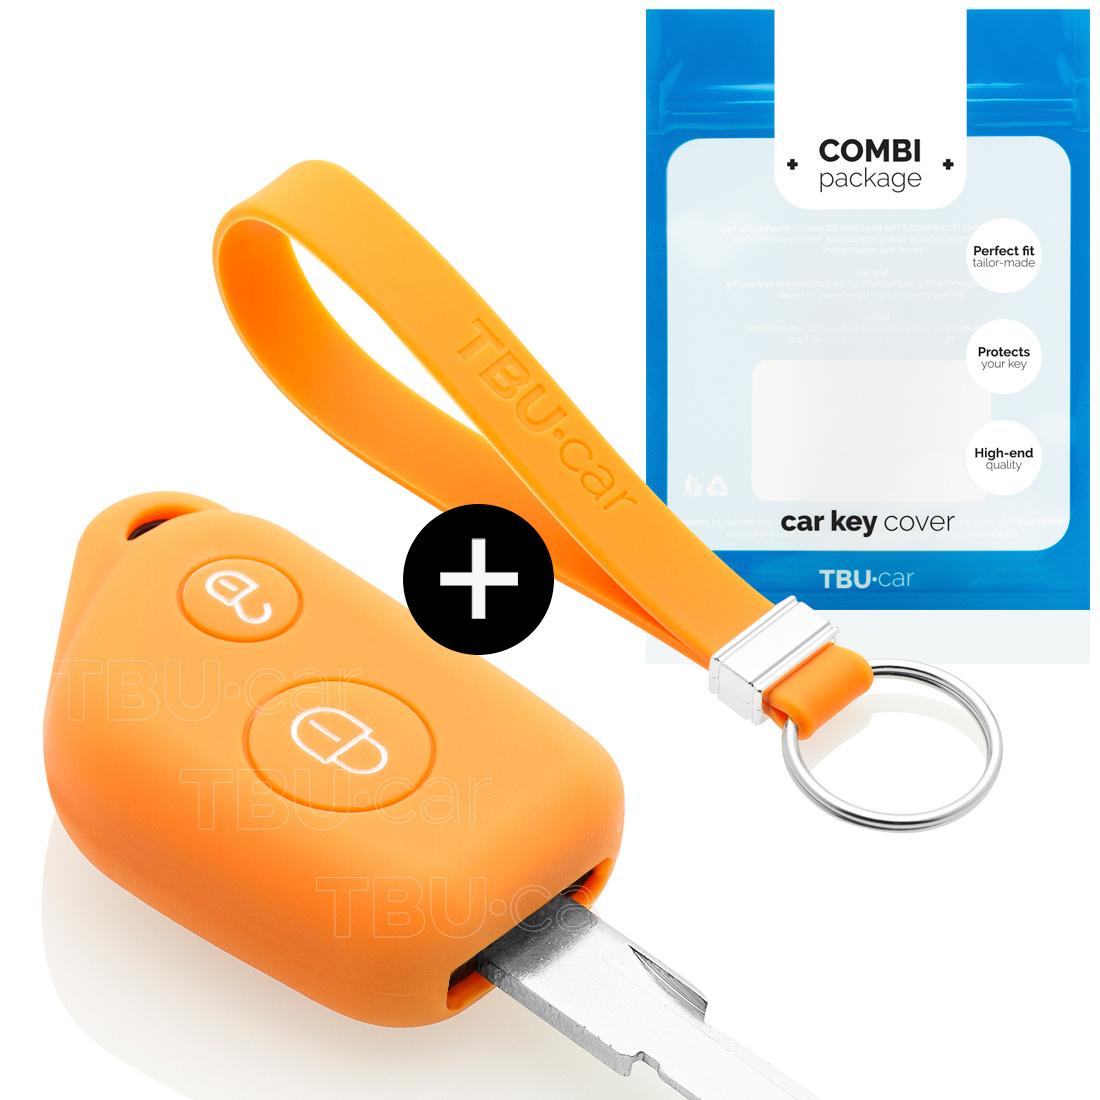 TBU car Autoschlüssel Hülle für Peugeot 2 Tasten - Schutzhülle aus Silikon - Auto Schlüsselhülle Cover in Orange